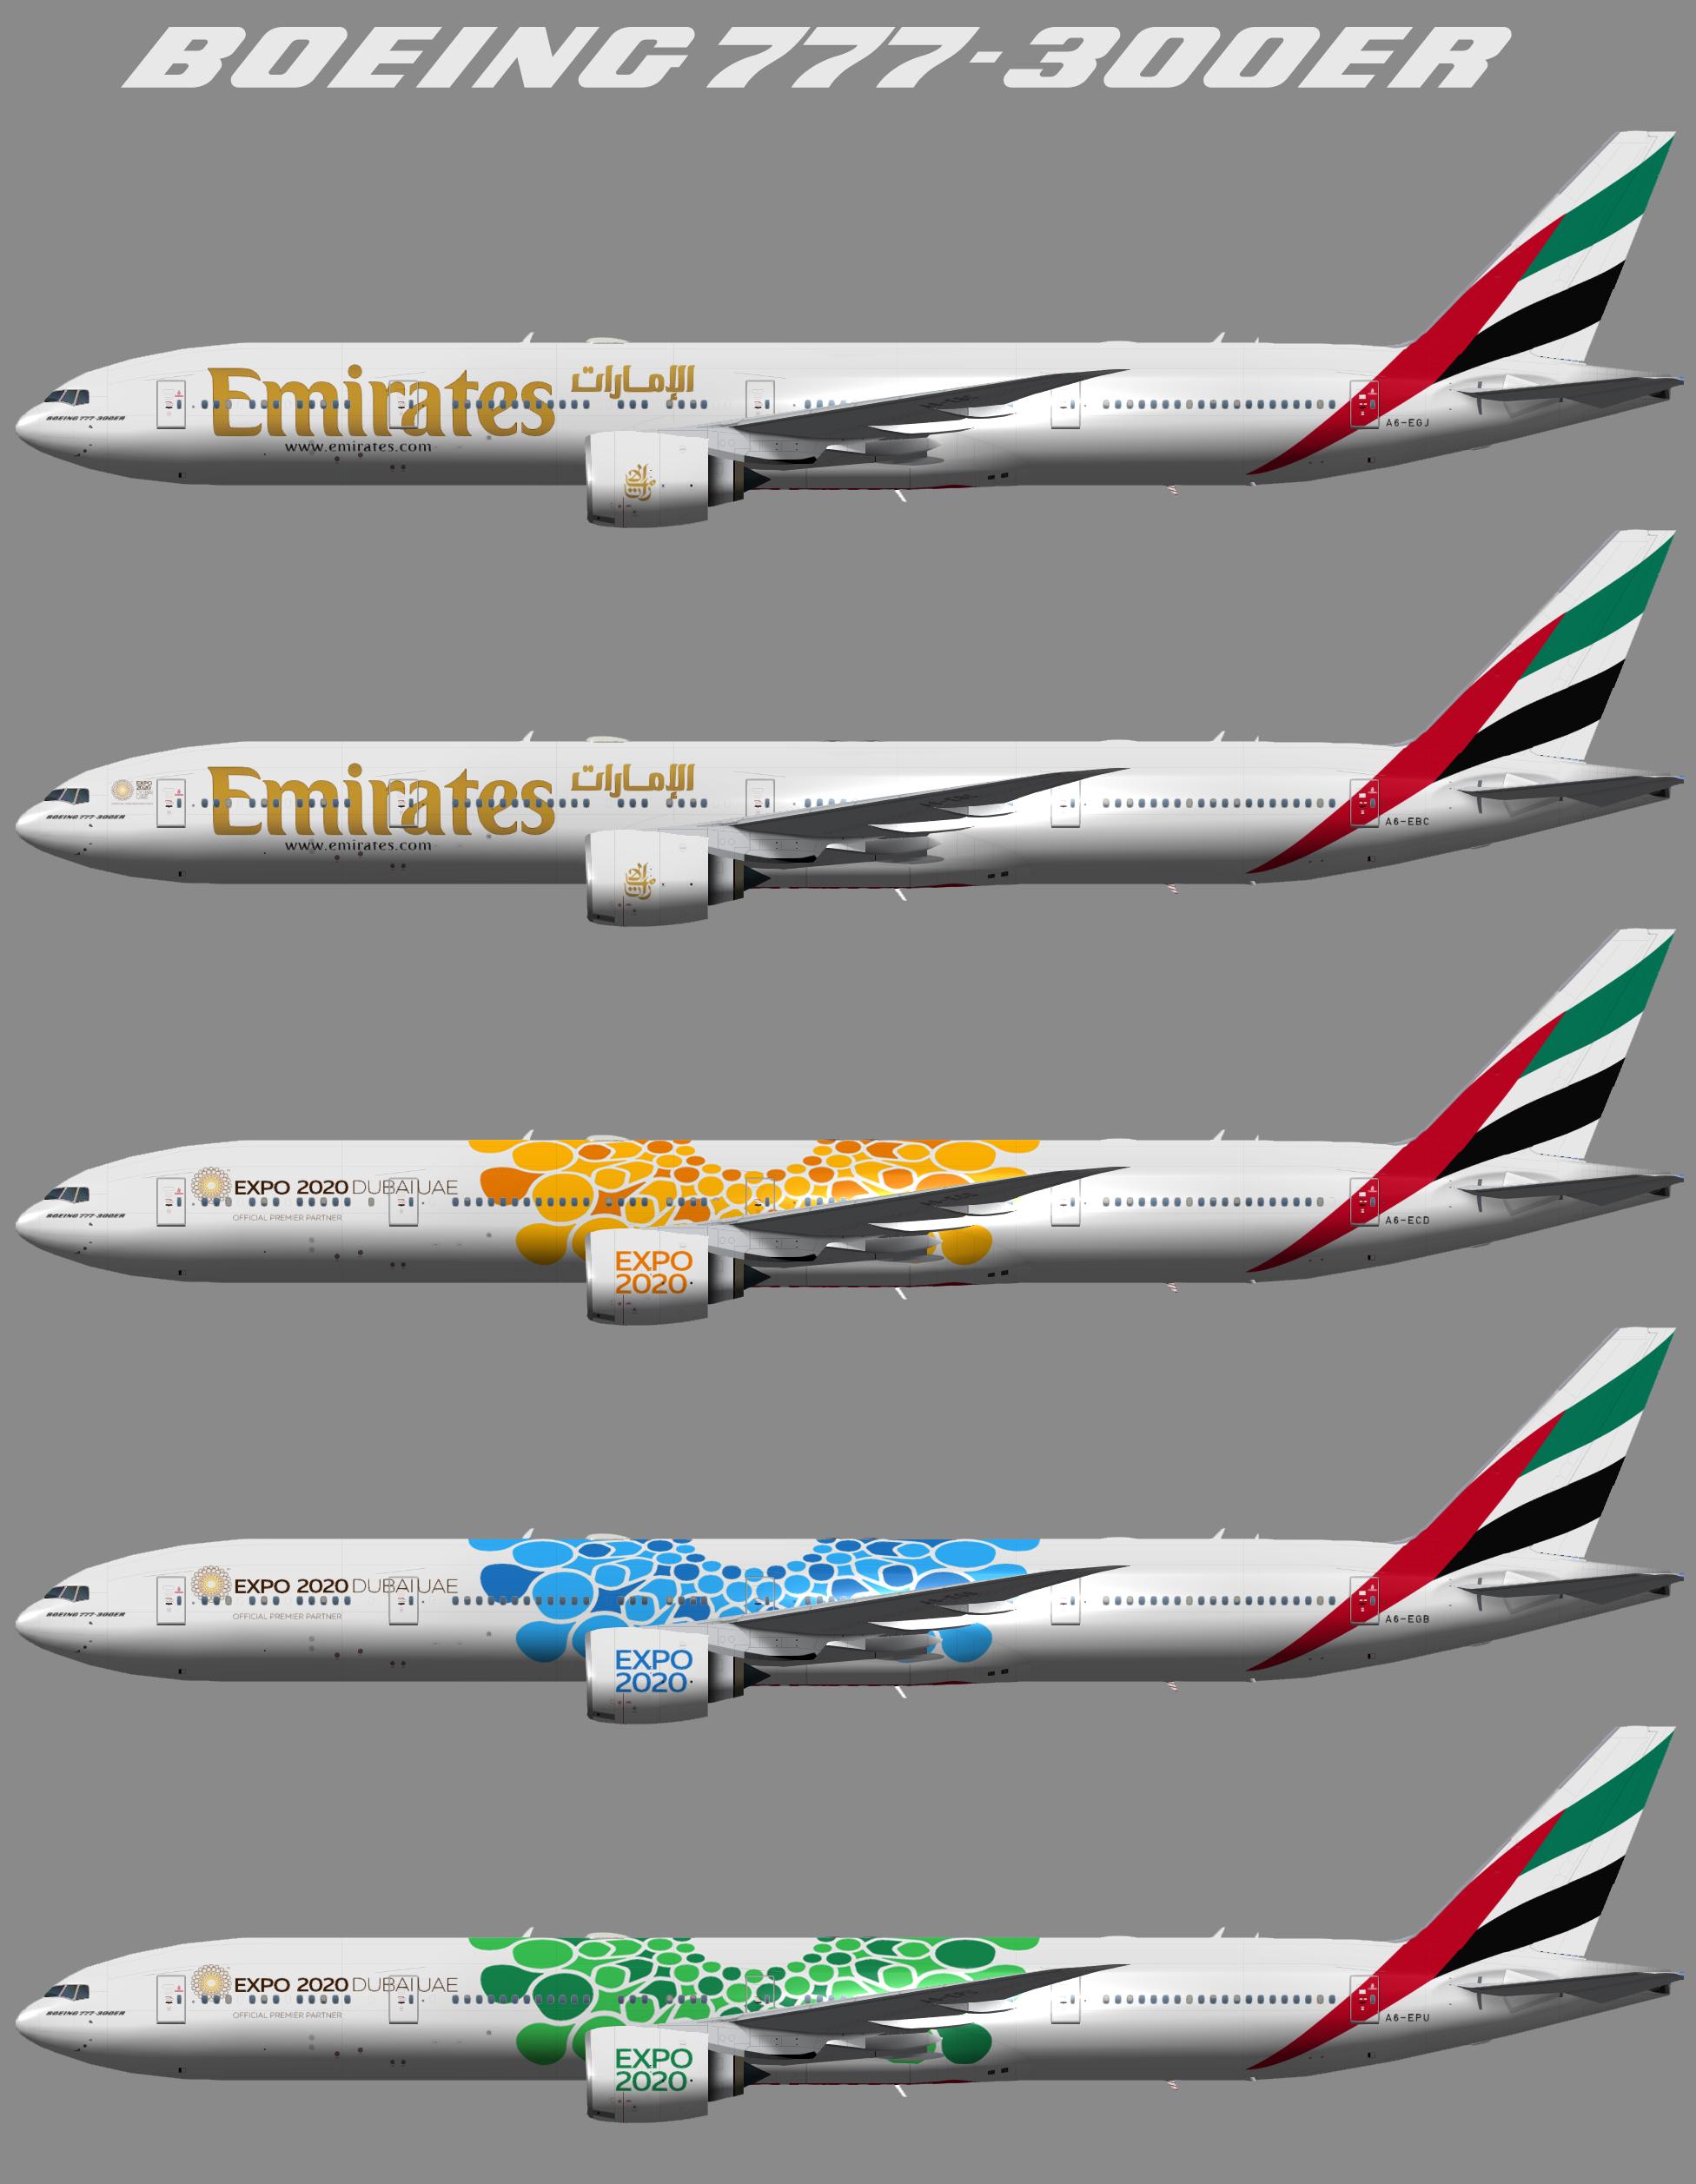 Emirates Boeing 777-300ER (TFS)